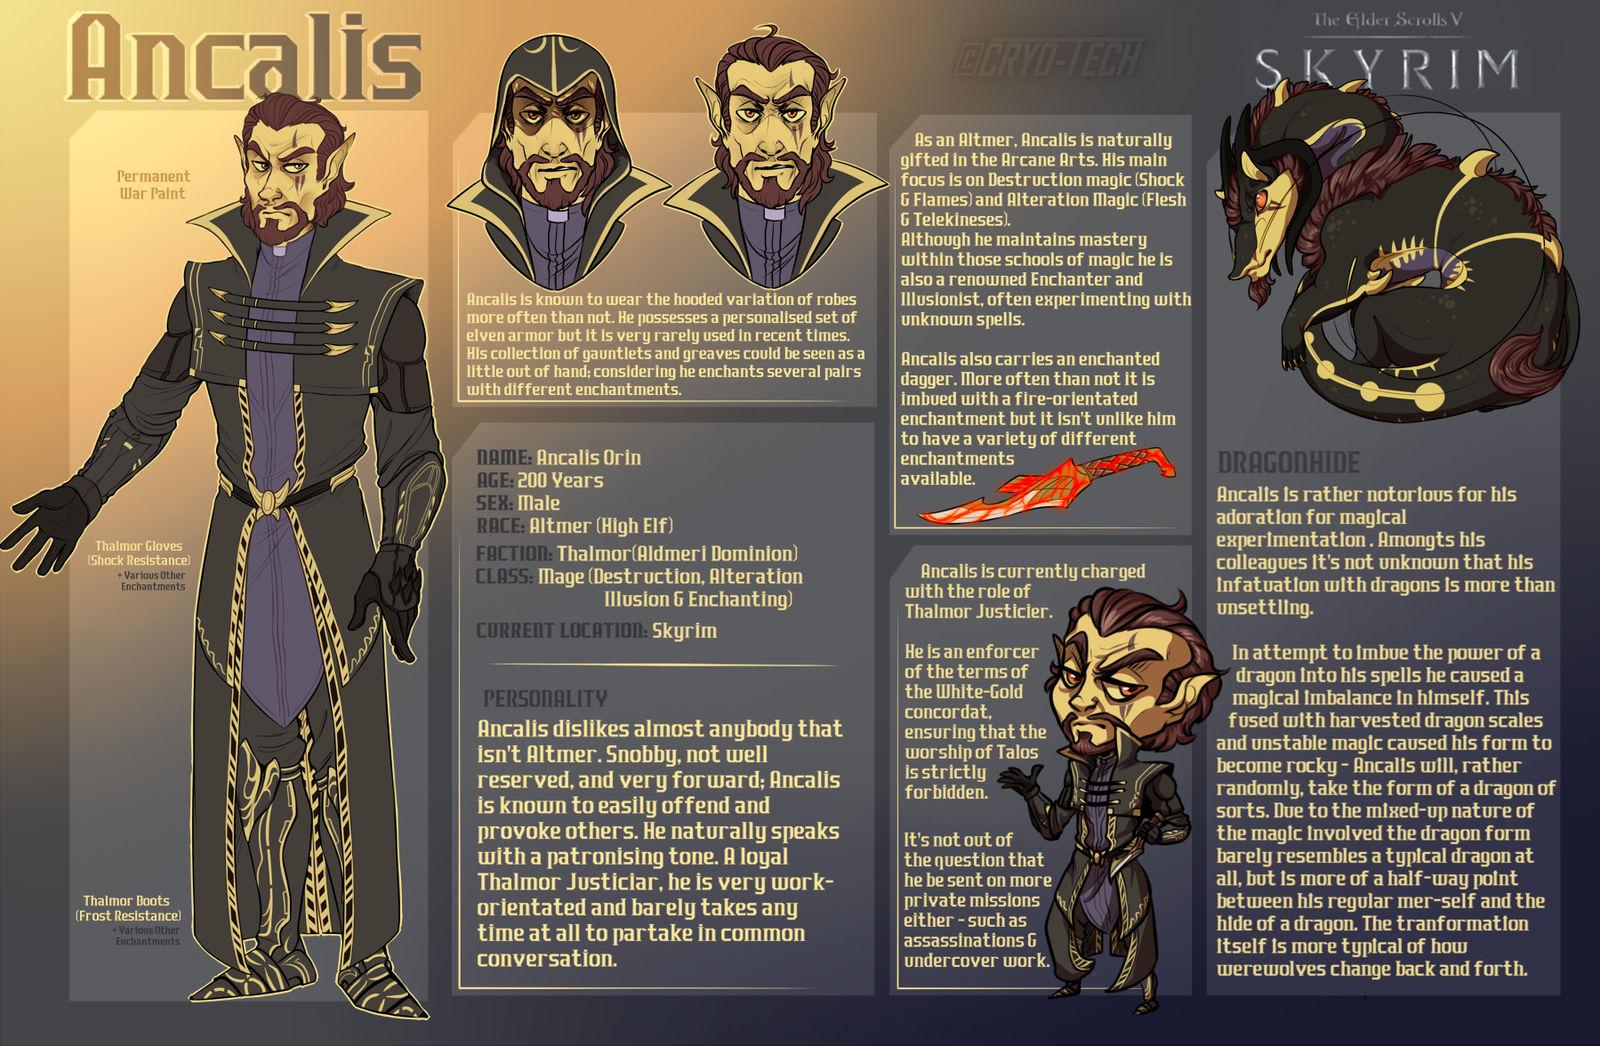 Skyrim RPC : Ancalis Orin by Aldarch on DeviantArt